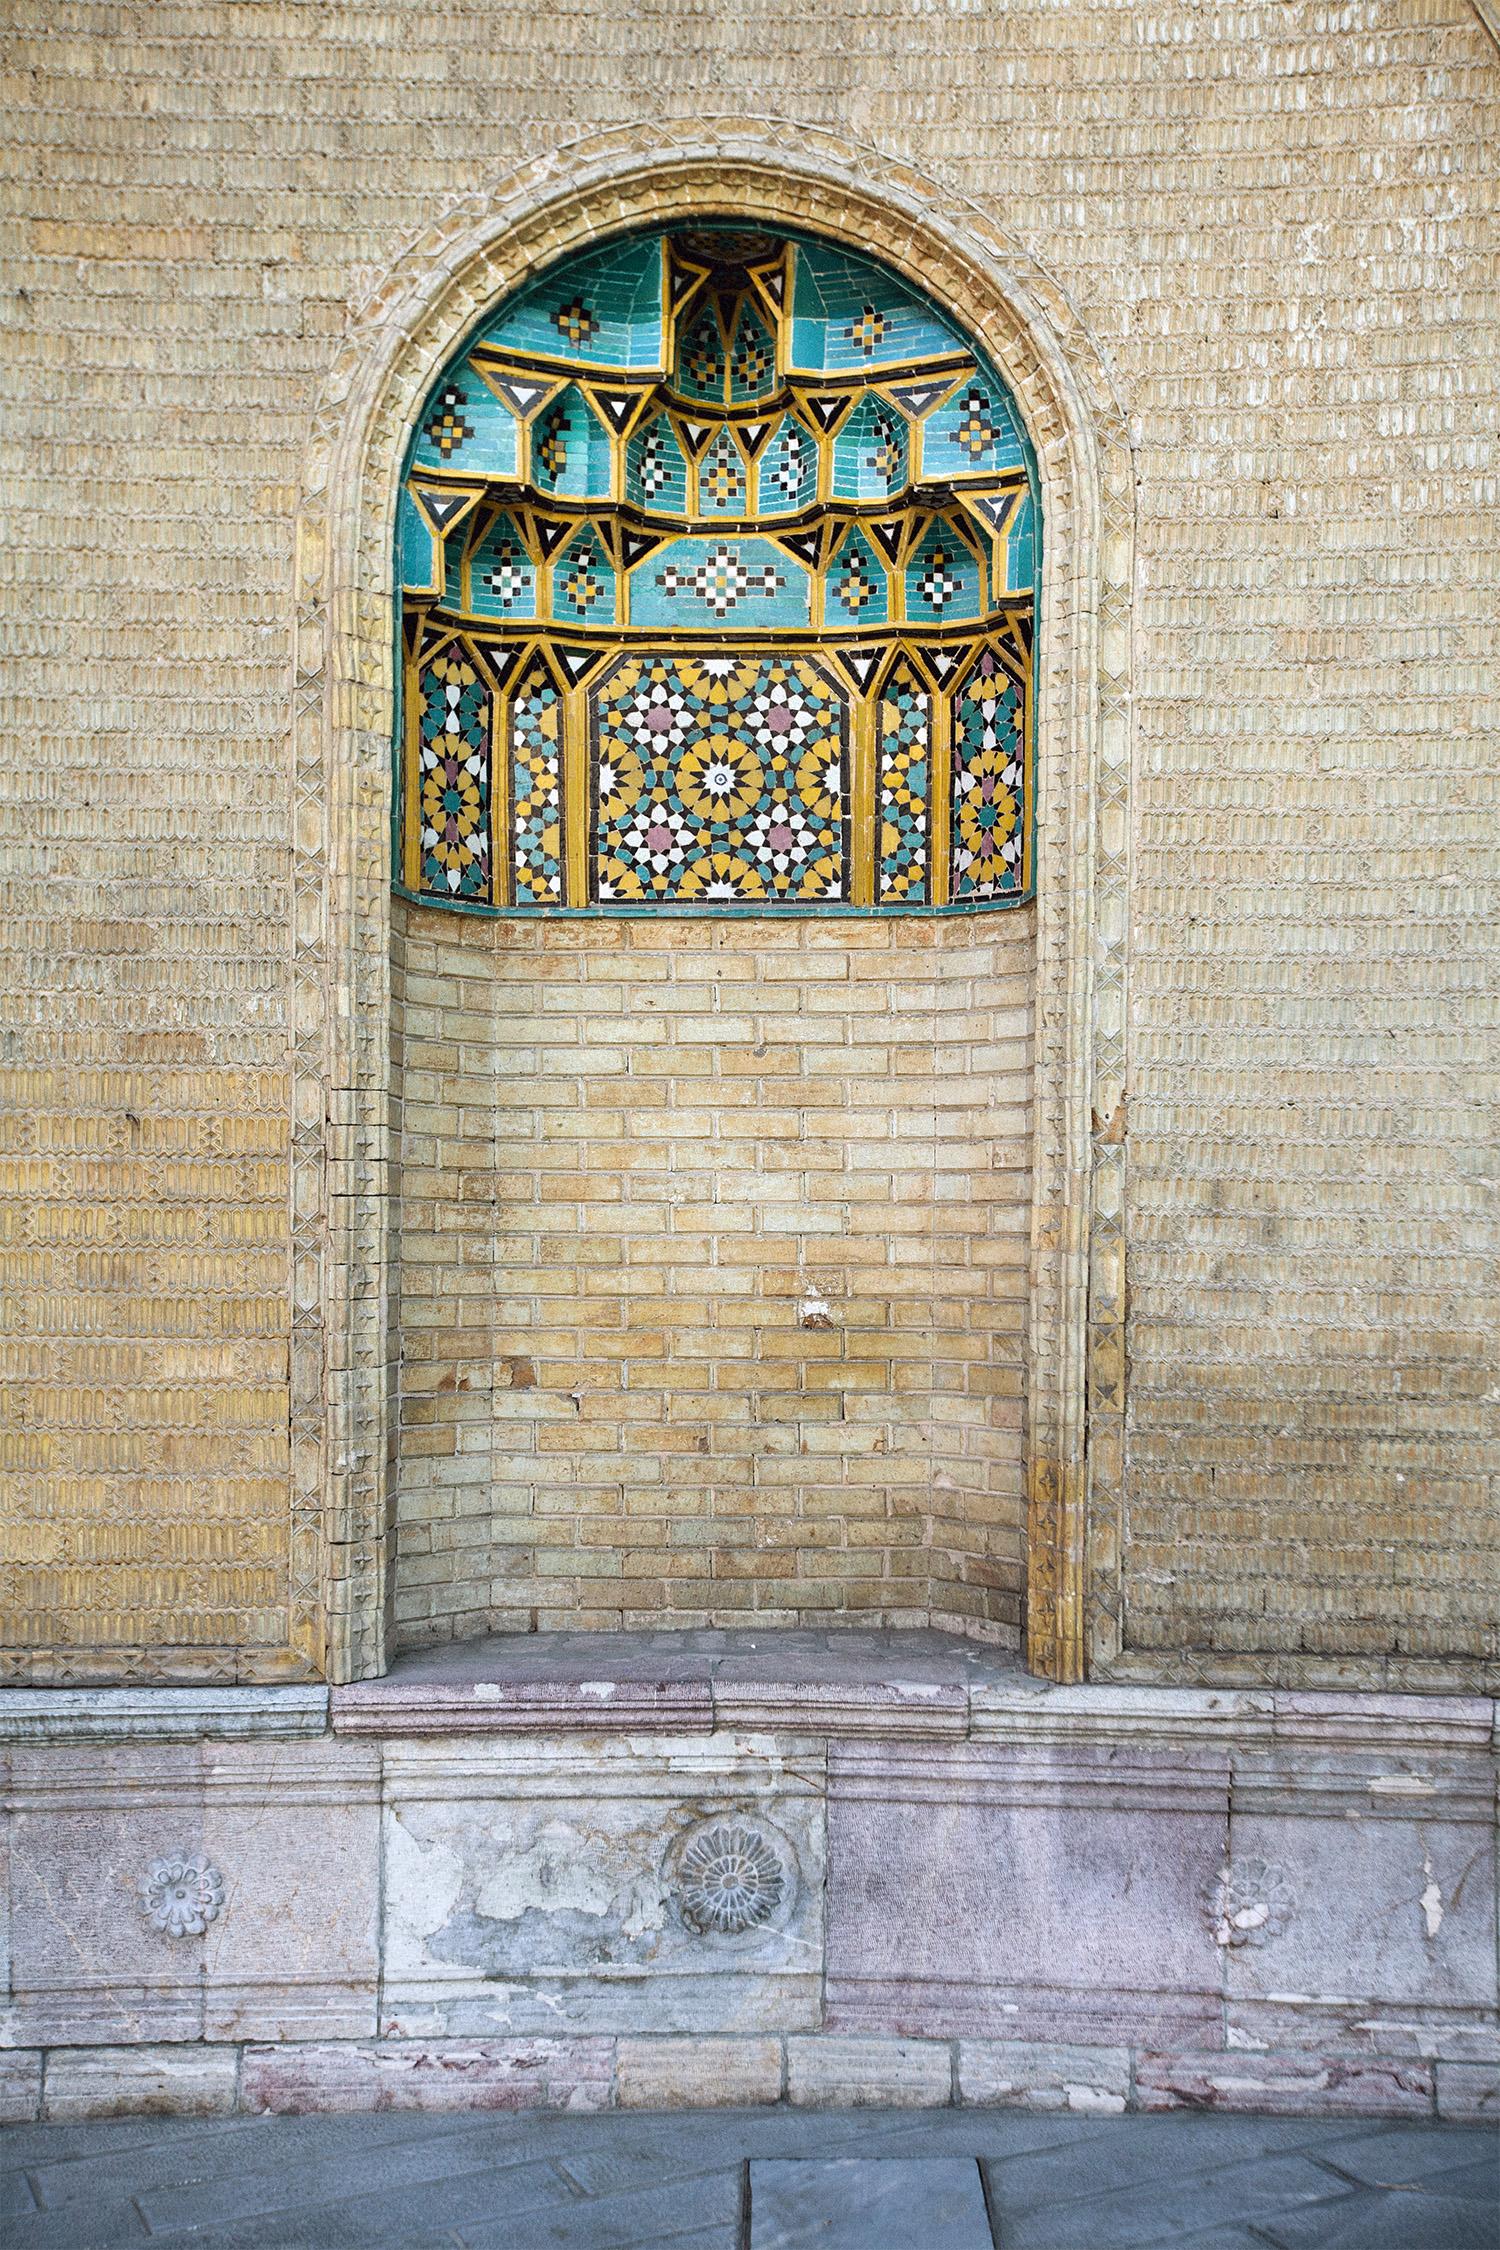 lifestyle-editorial-travel-washington-dc-malek-naz-photography-mosaic-iran-tehran.jpg